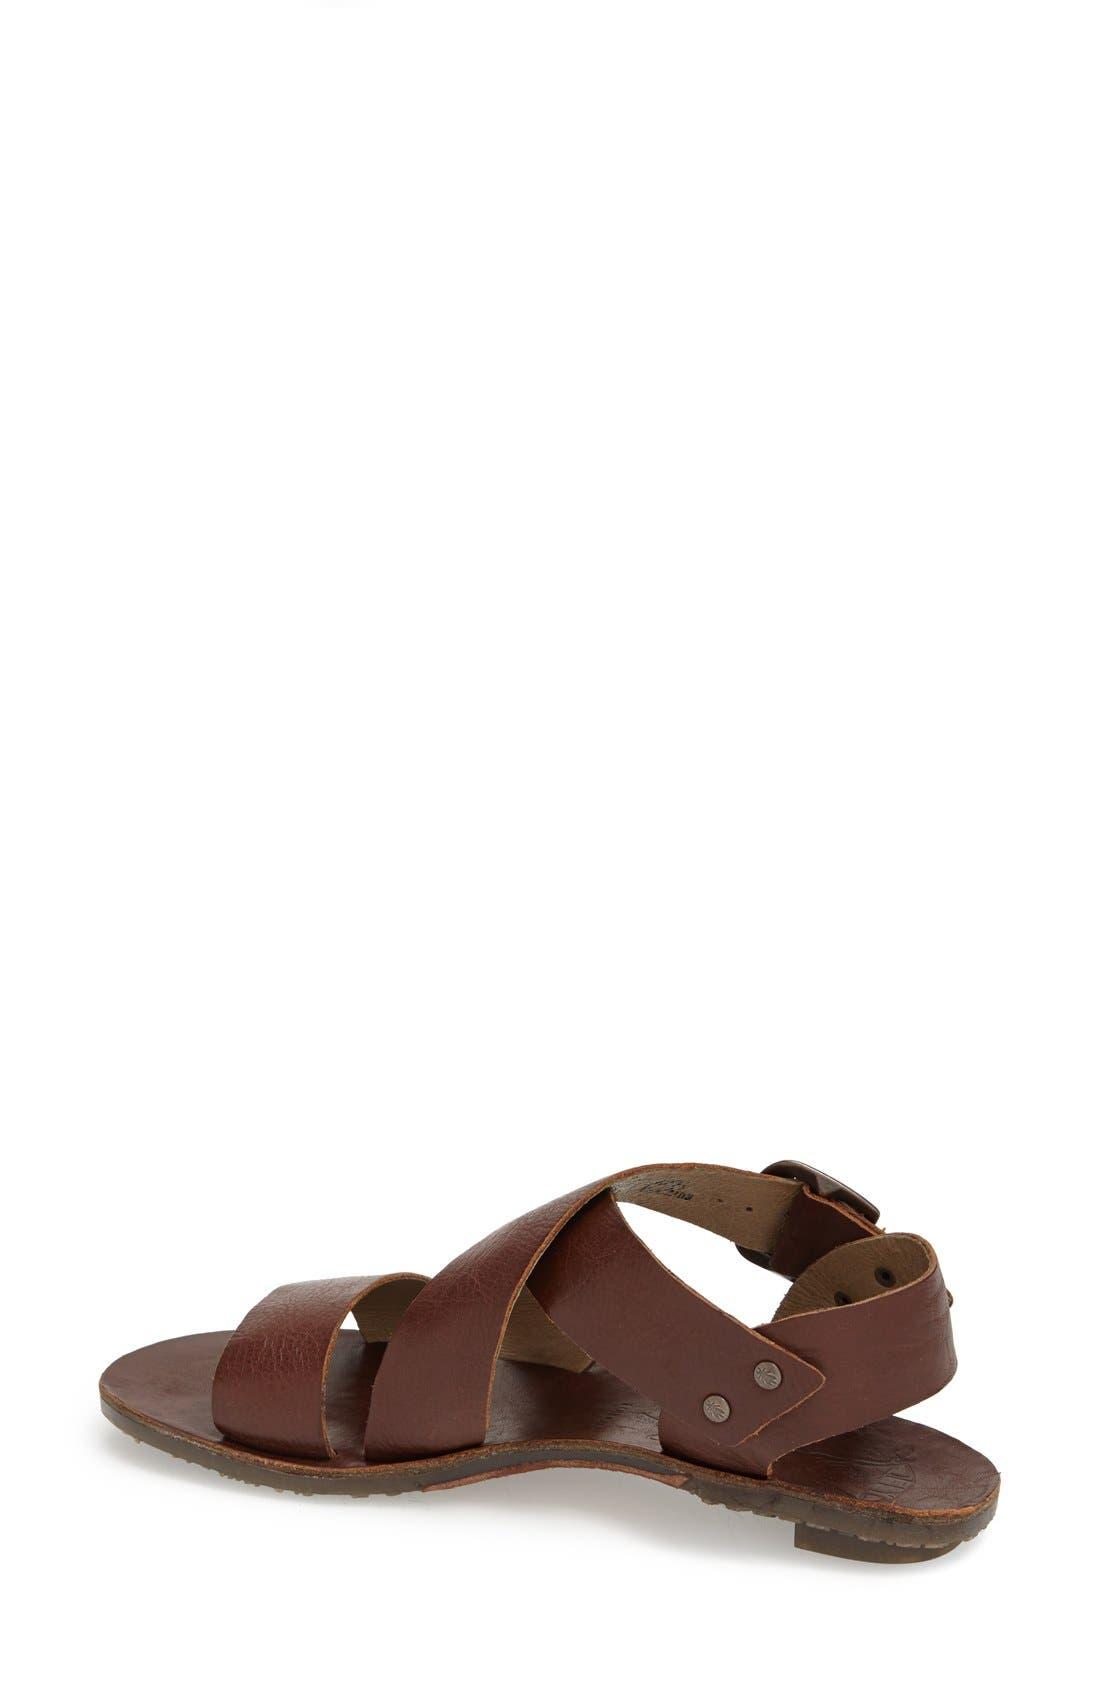 Alternate Image 2  - Fly London 'Bian' Flat Leather Sandal (Women)